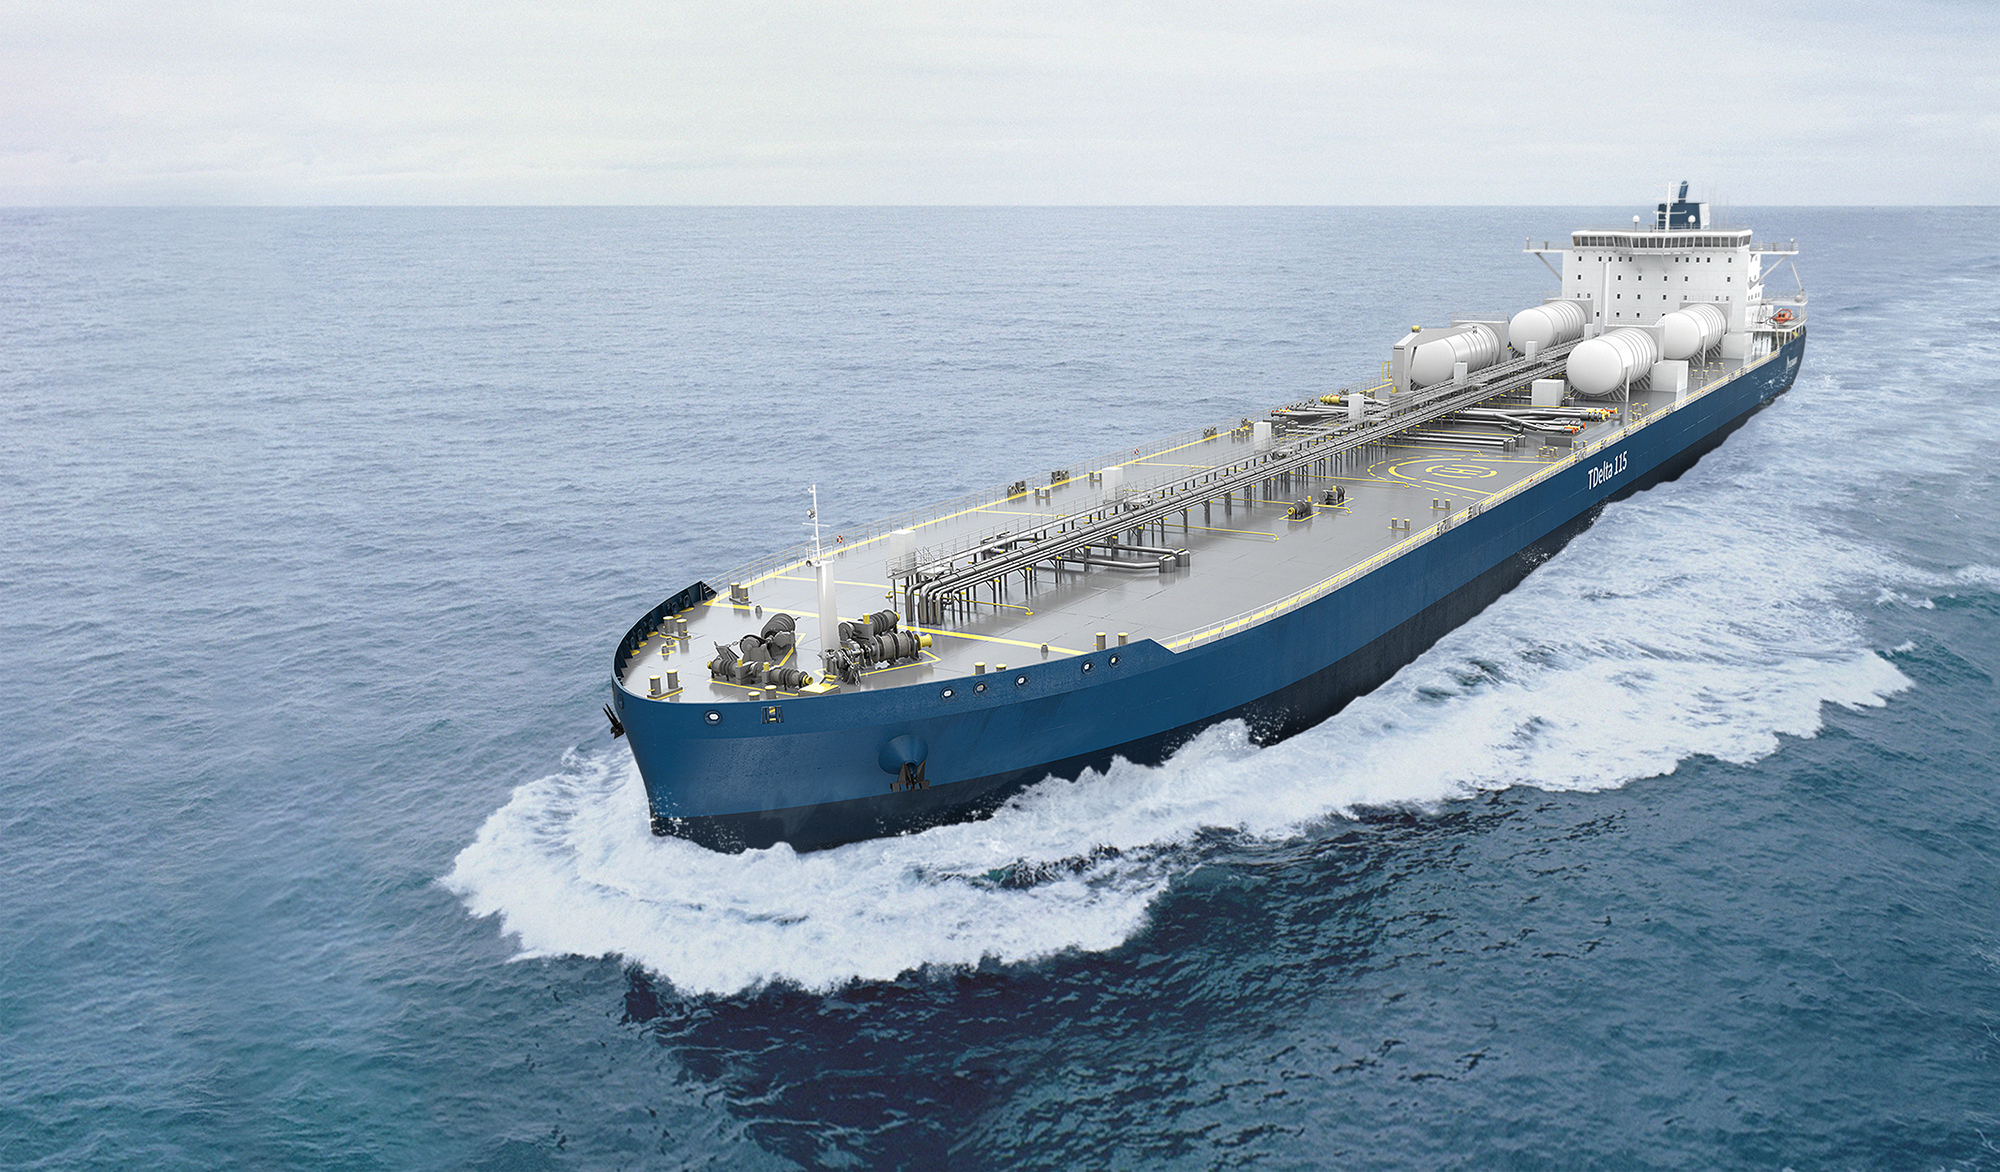 Aframax tanker - credit Deltamarin